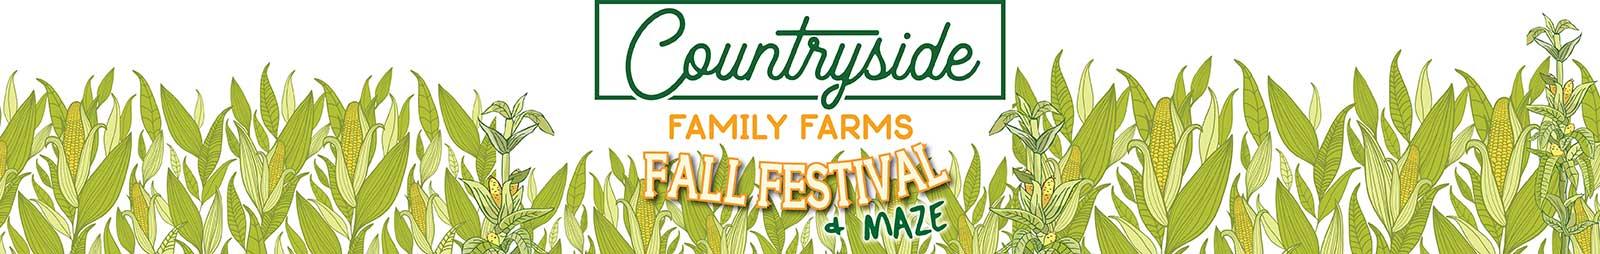 Countryside Family Farms Fall Festival & Maze